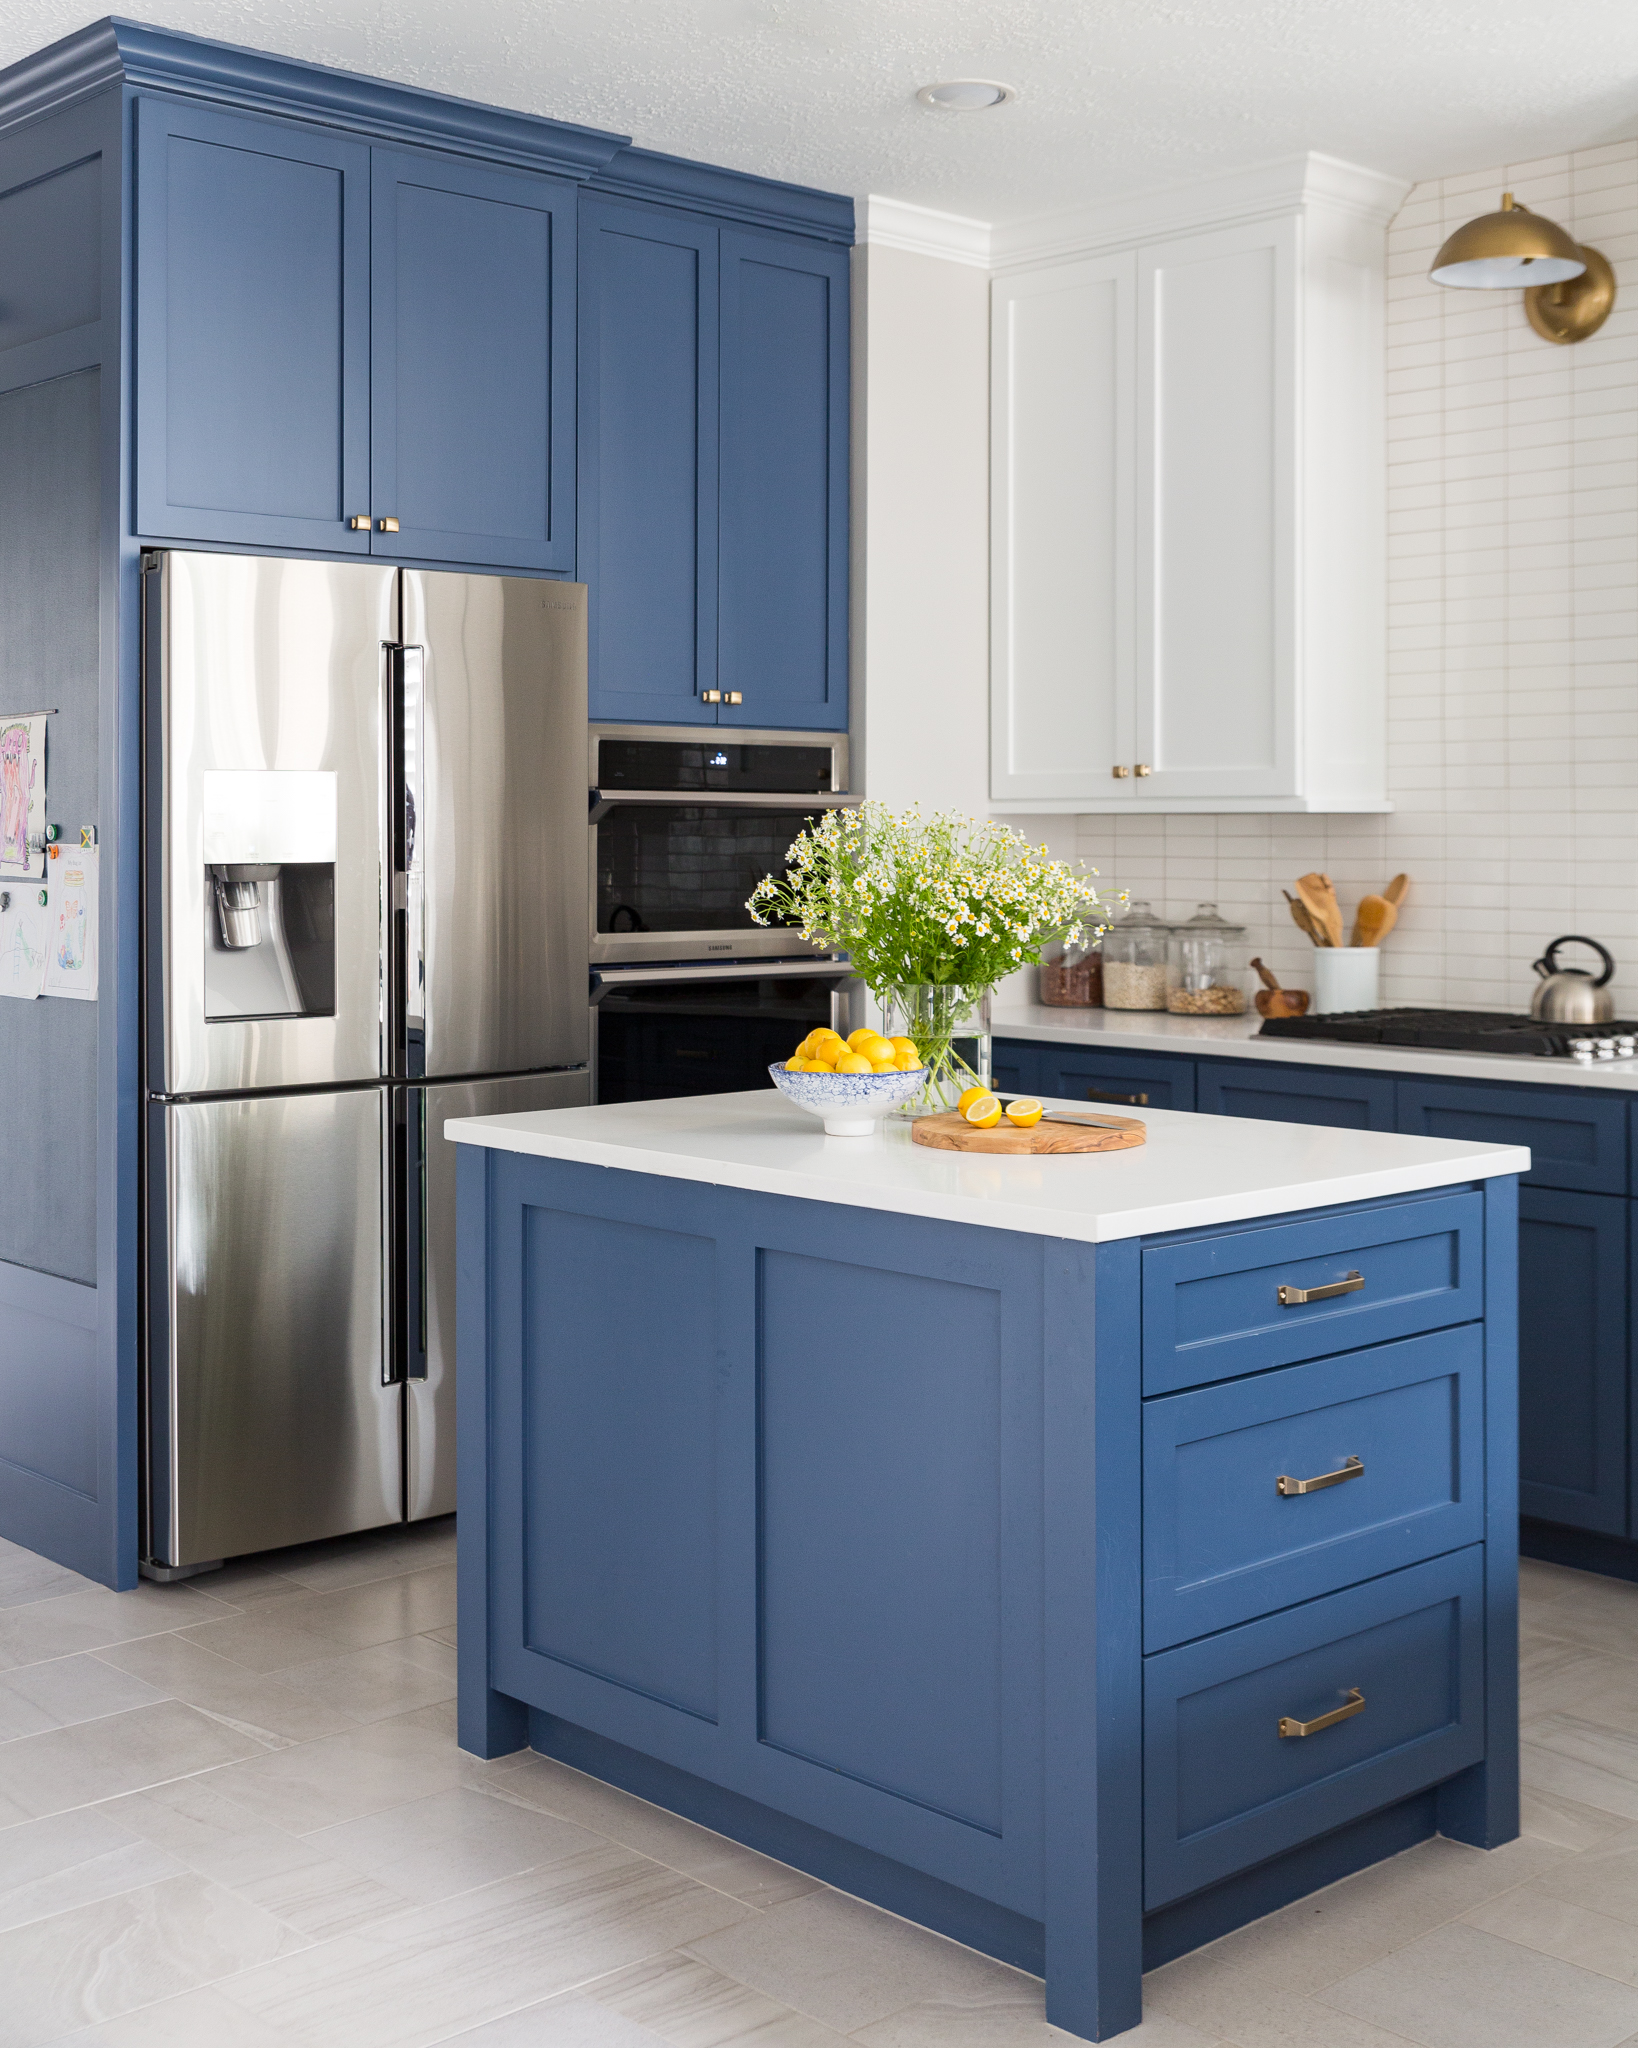 Kitchen remodel - new island with navy cabinets and white quartz countertop in rectangular shape   Carla Aston, Designer #kitchenisland #navycabinets #kitchenremodelingideas